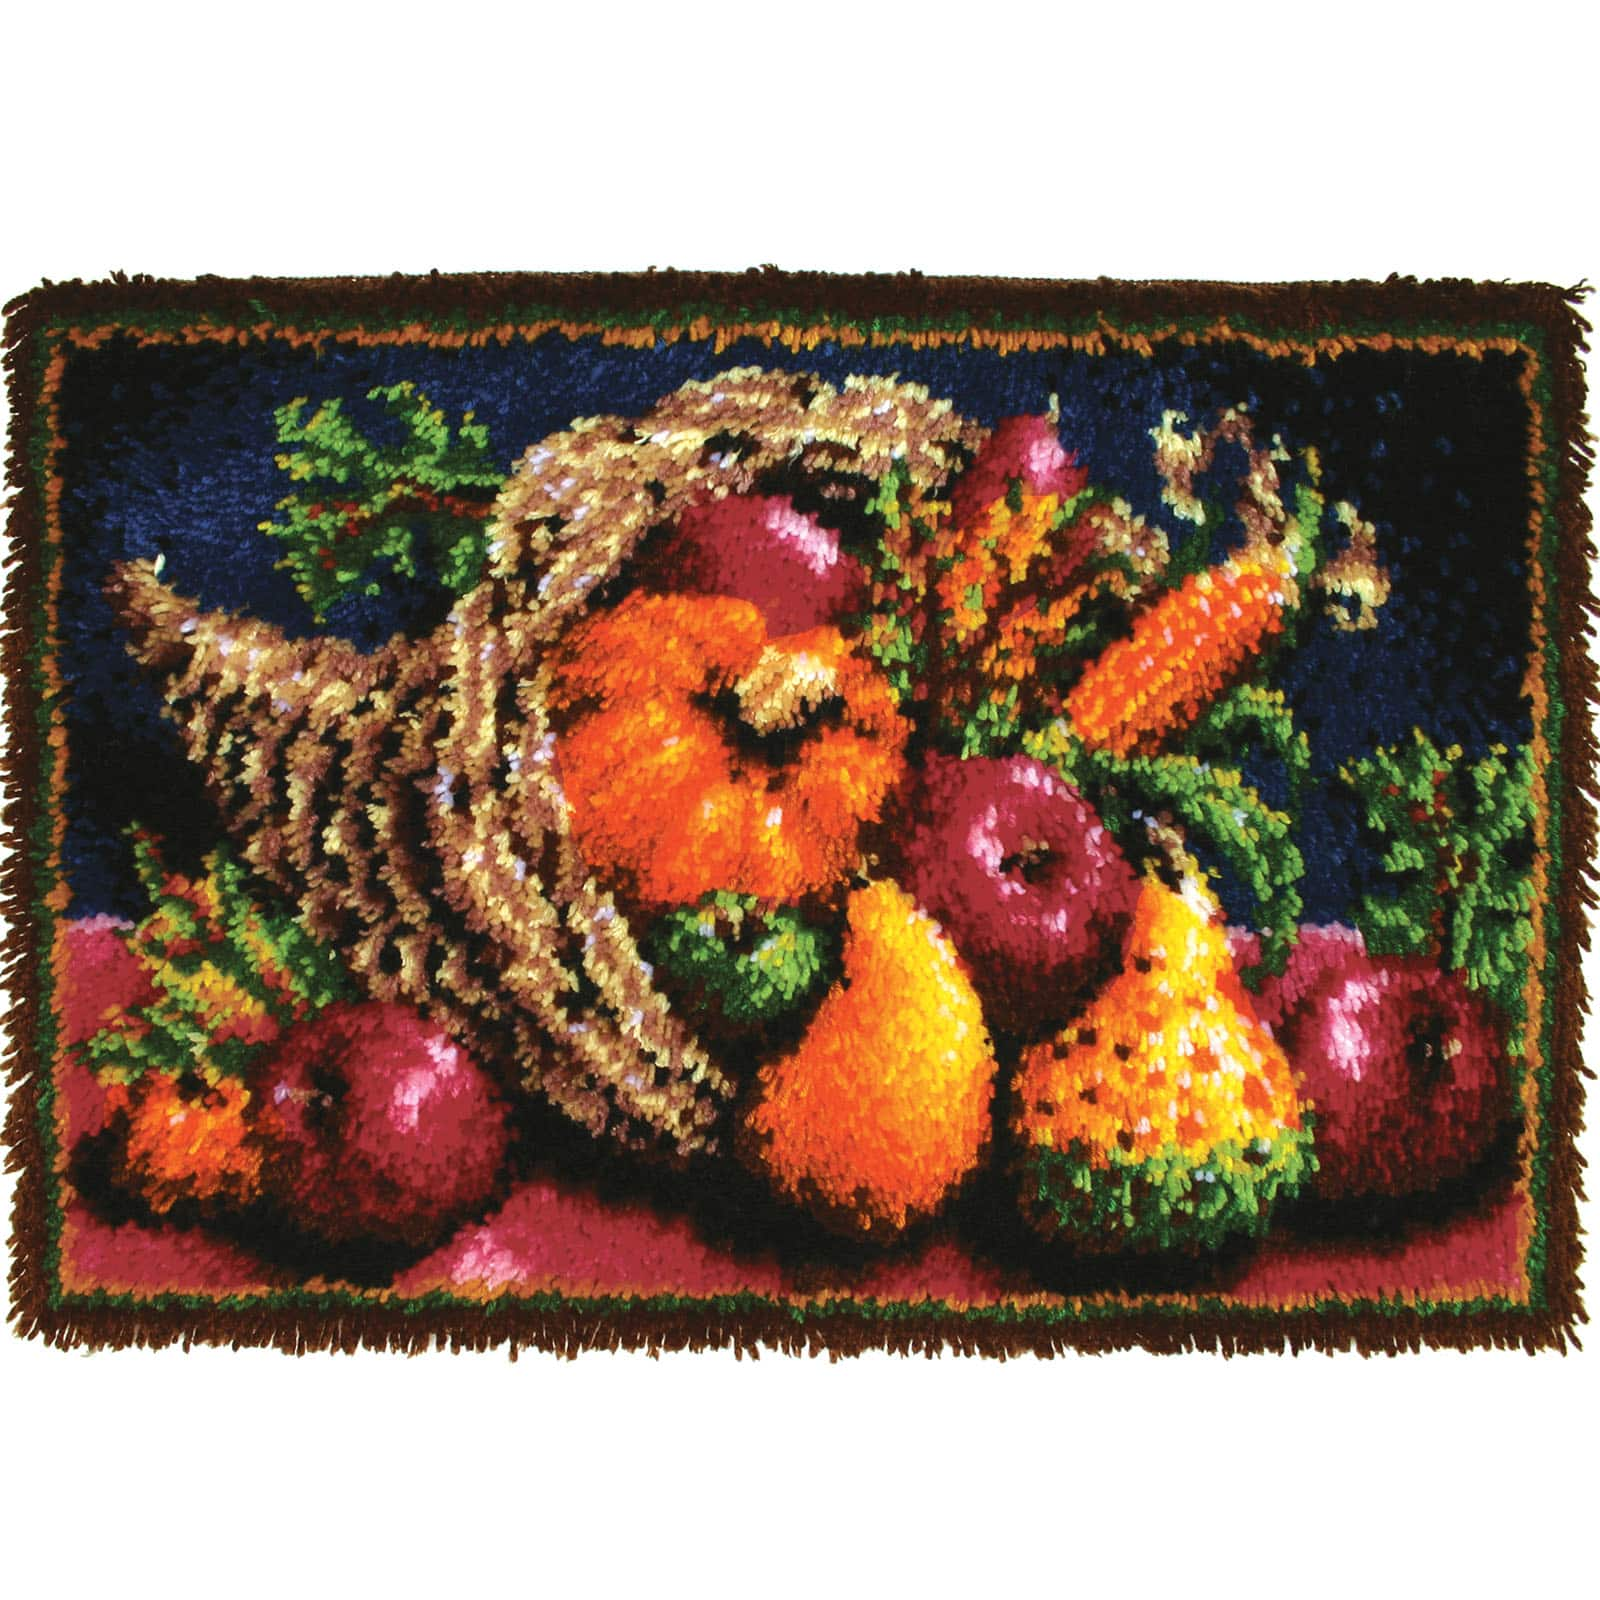 Wonderart Classic Latch Hook Rug Kit Country Harvest